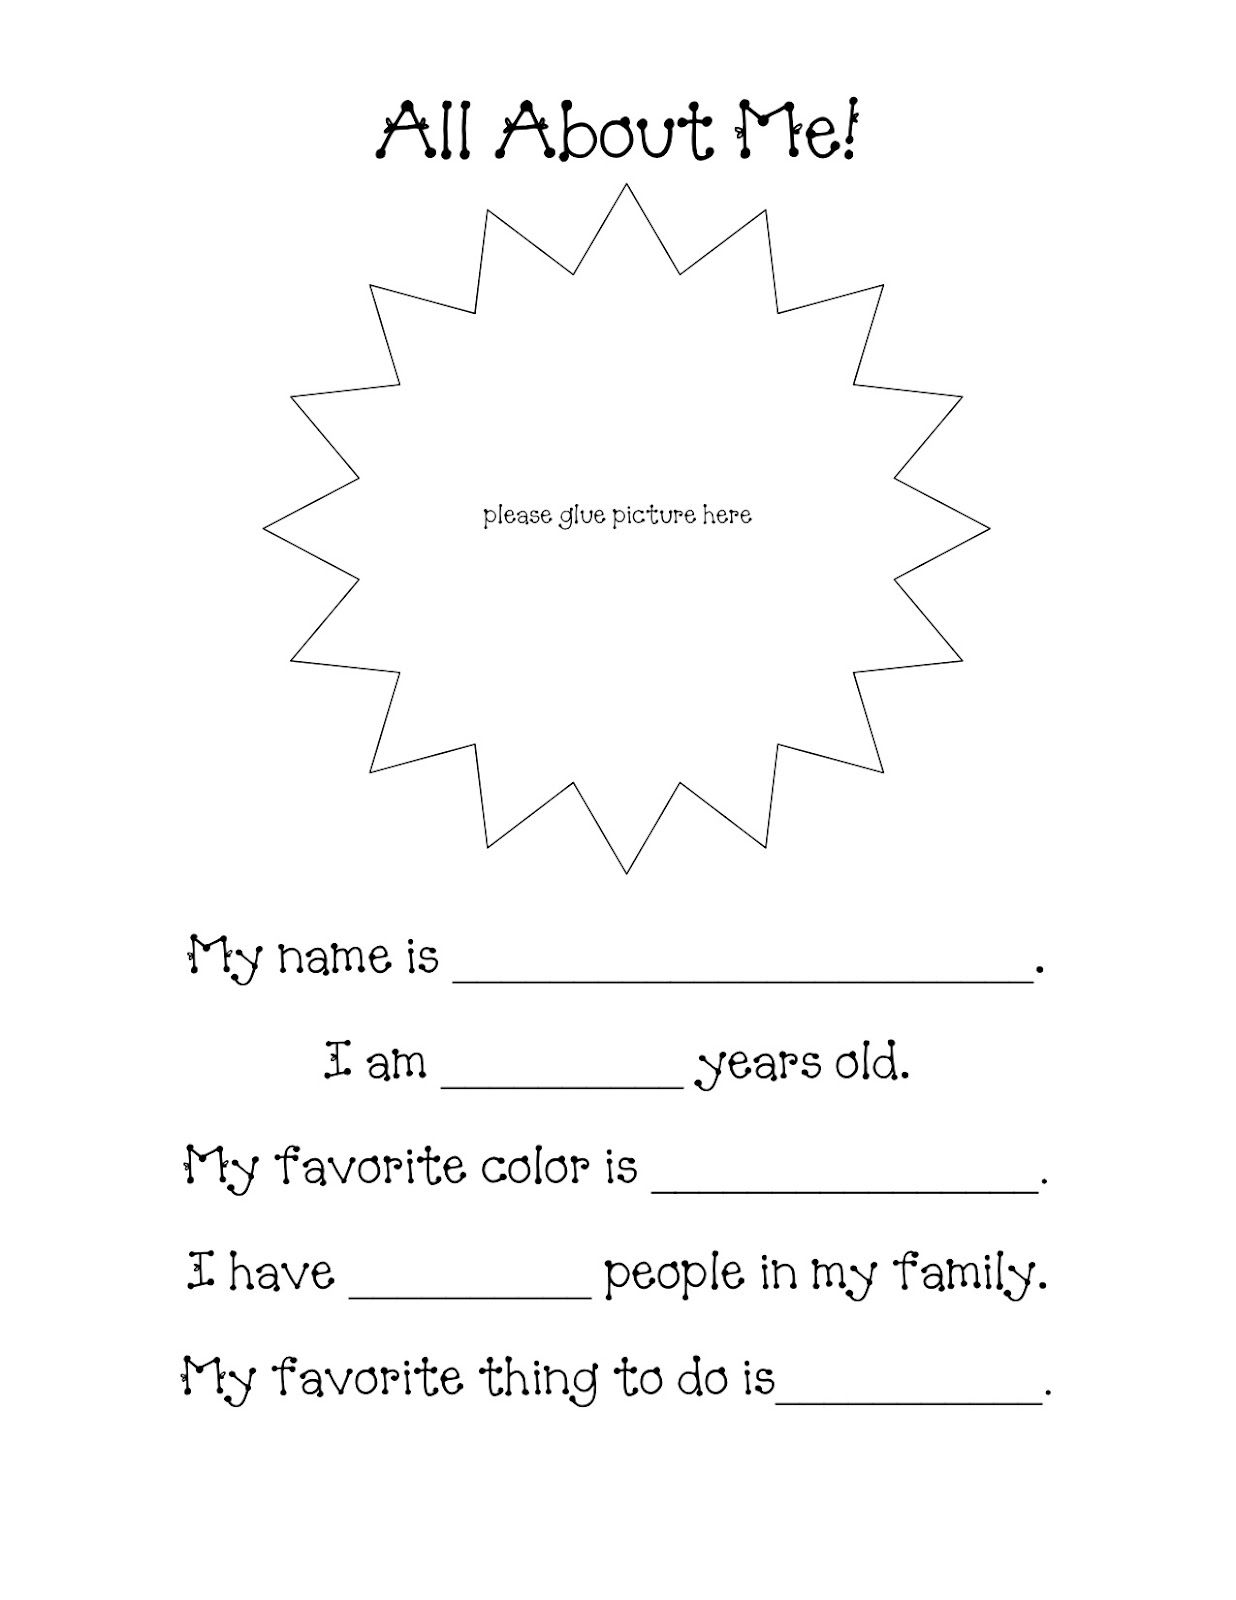 Pin By Cheralee Vohlken On Adventures In Kindergarten All About Me Preschool All About Me Book Preschool [ 1600 x 1236 Pixel ]